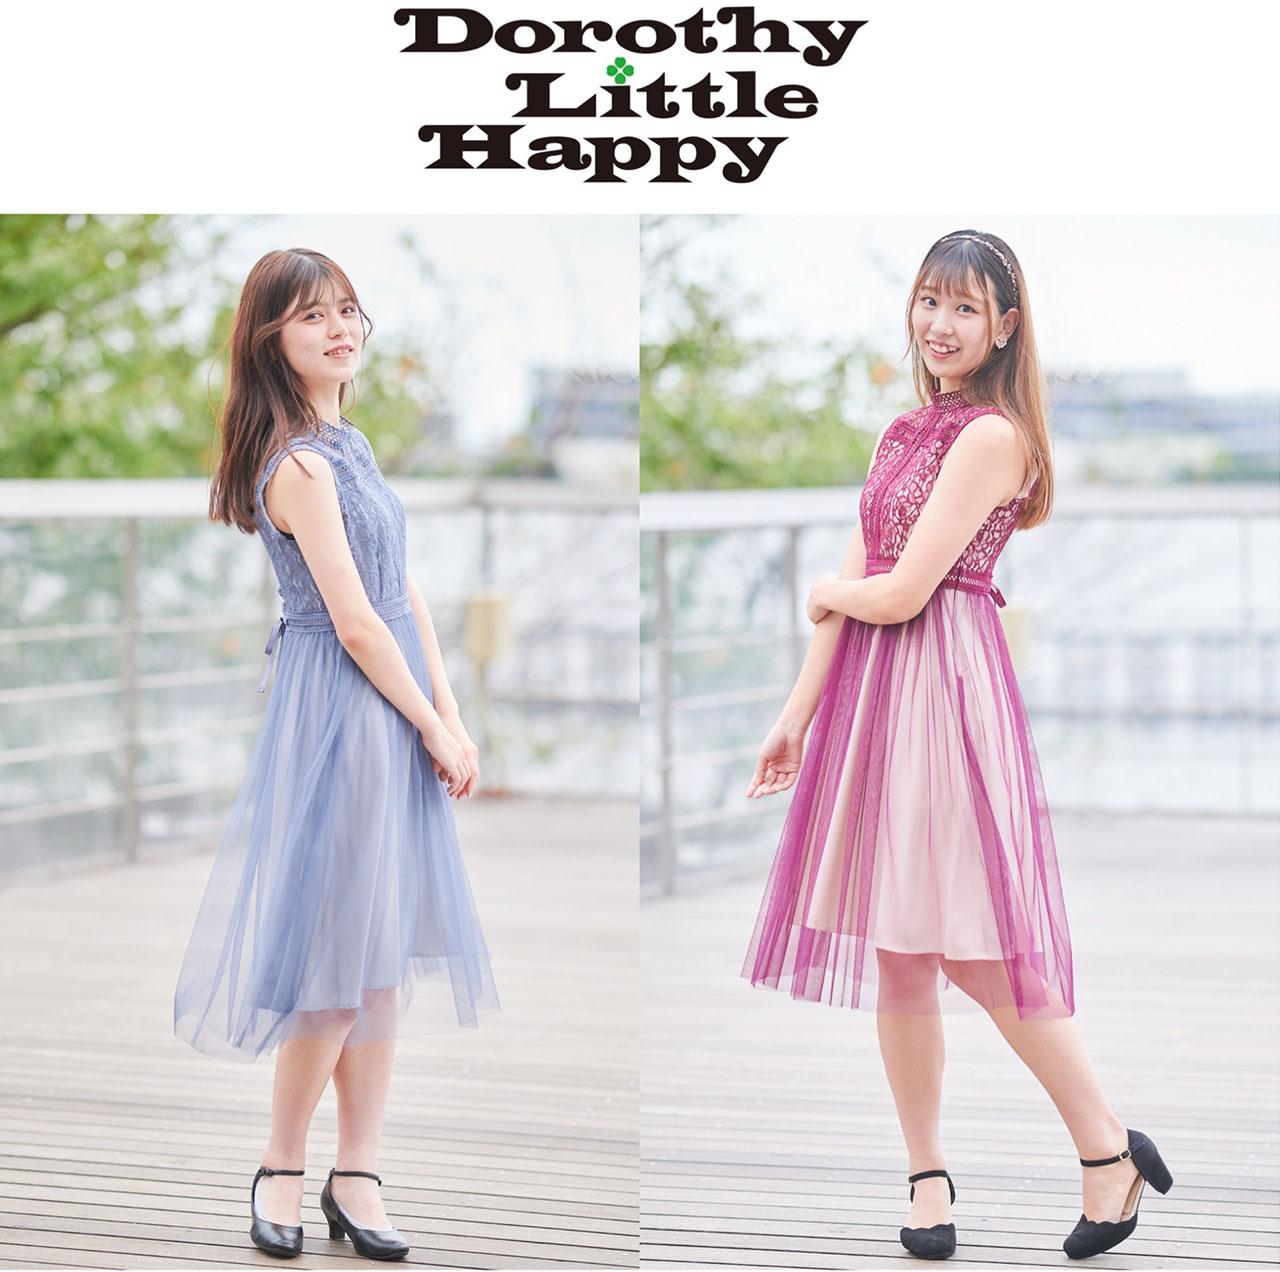 Dorothy Little Happy 栗村風香 加藤亜希菜